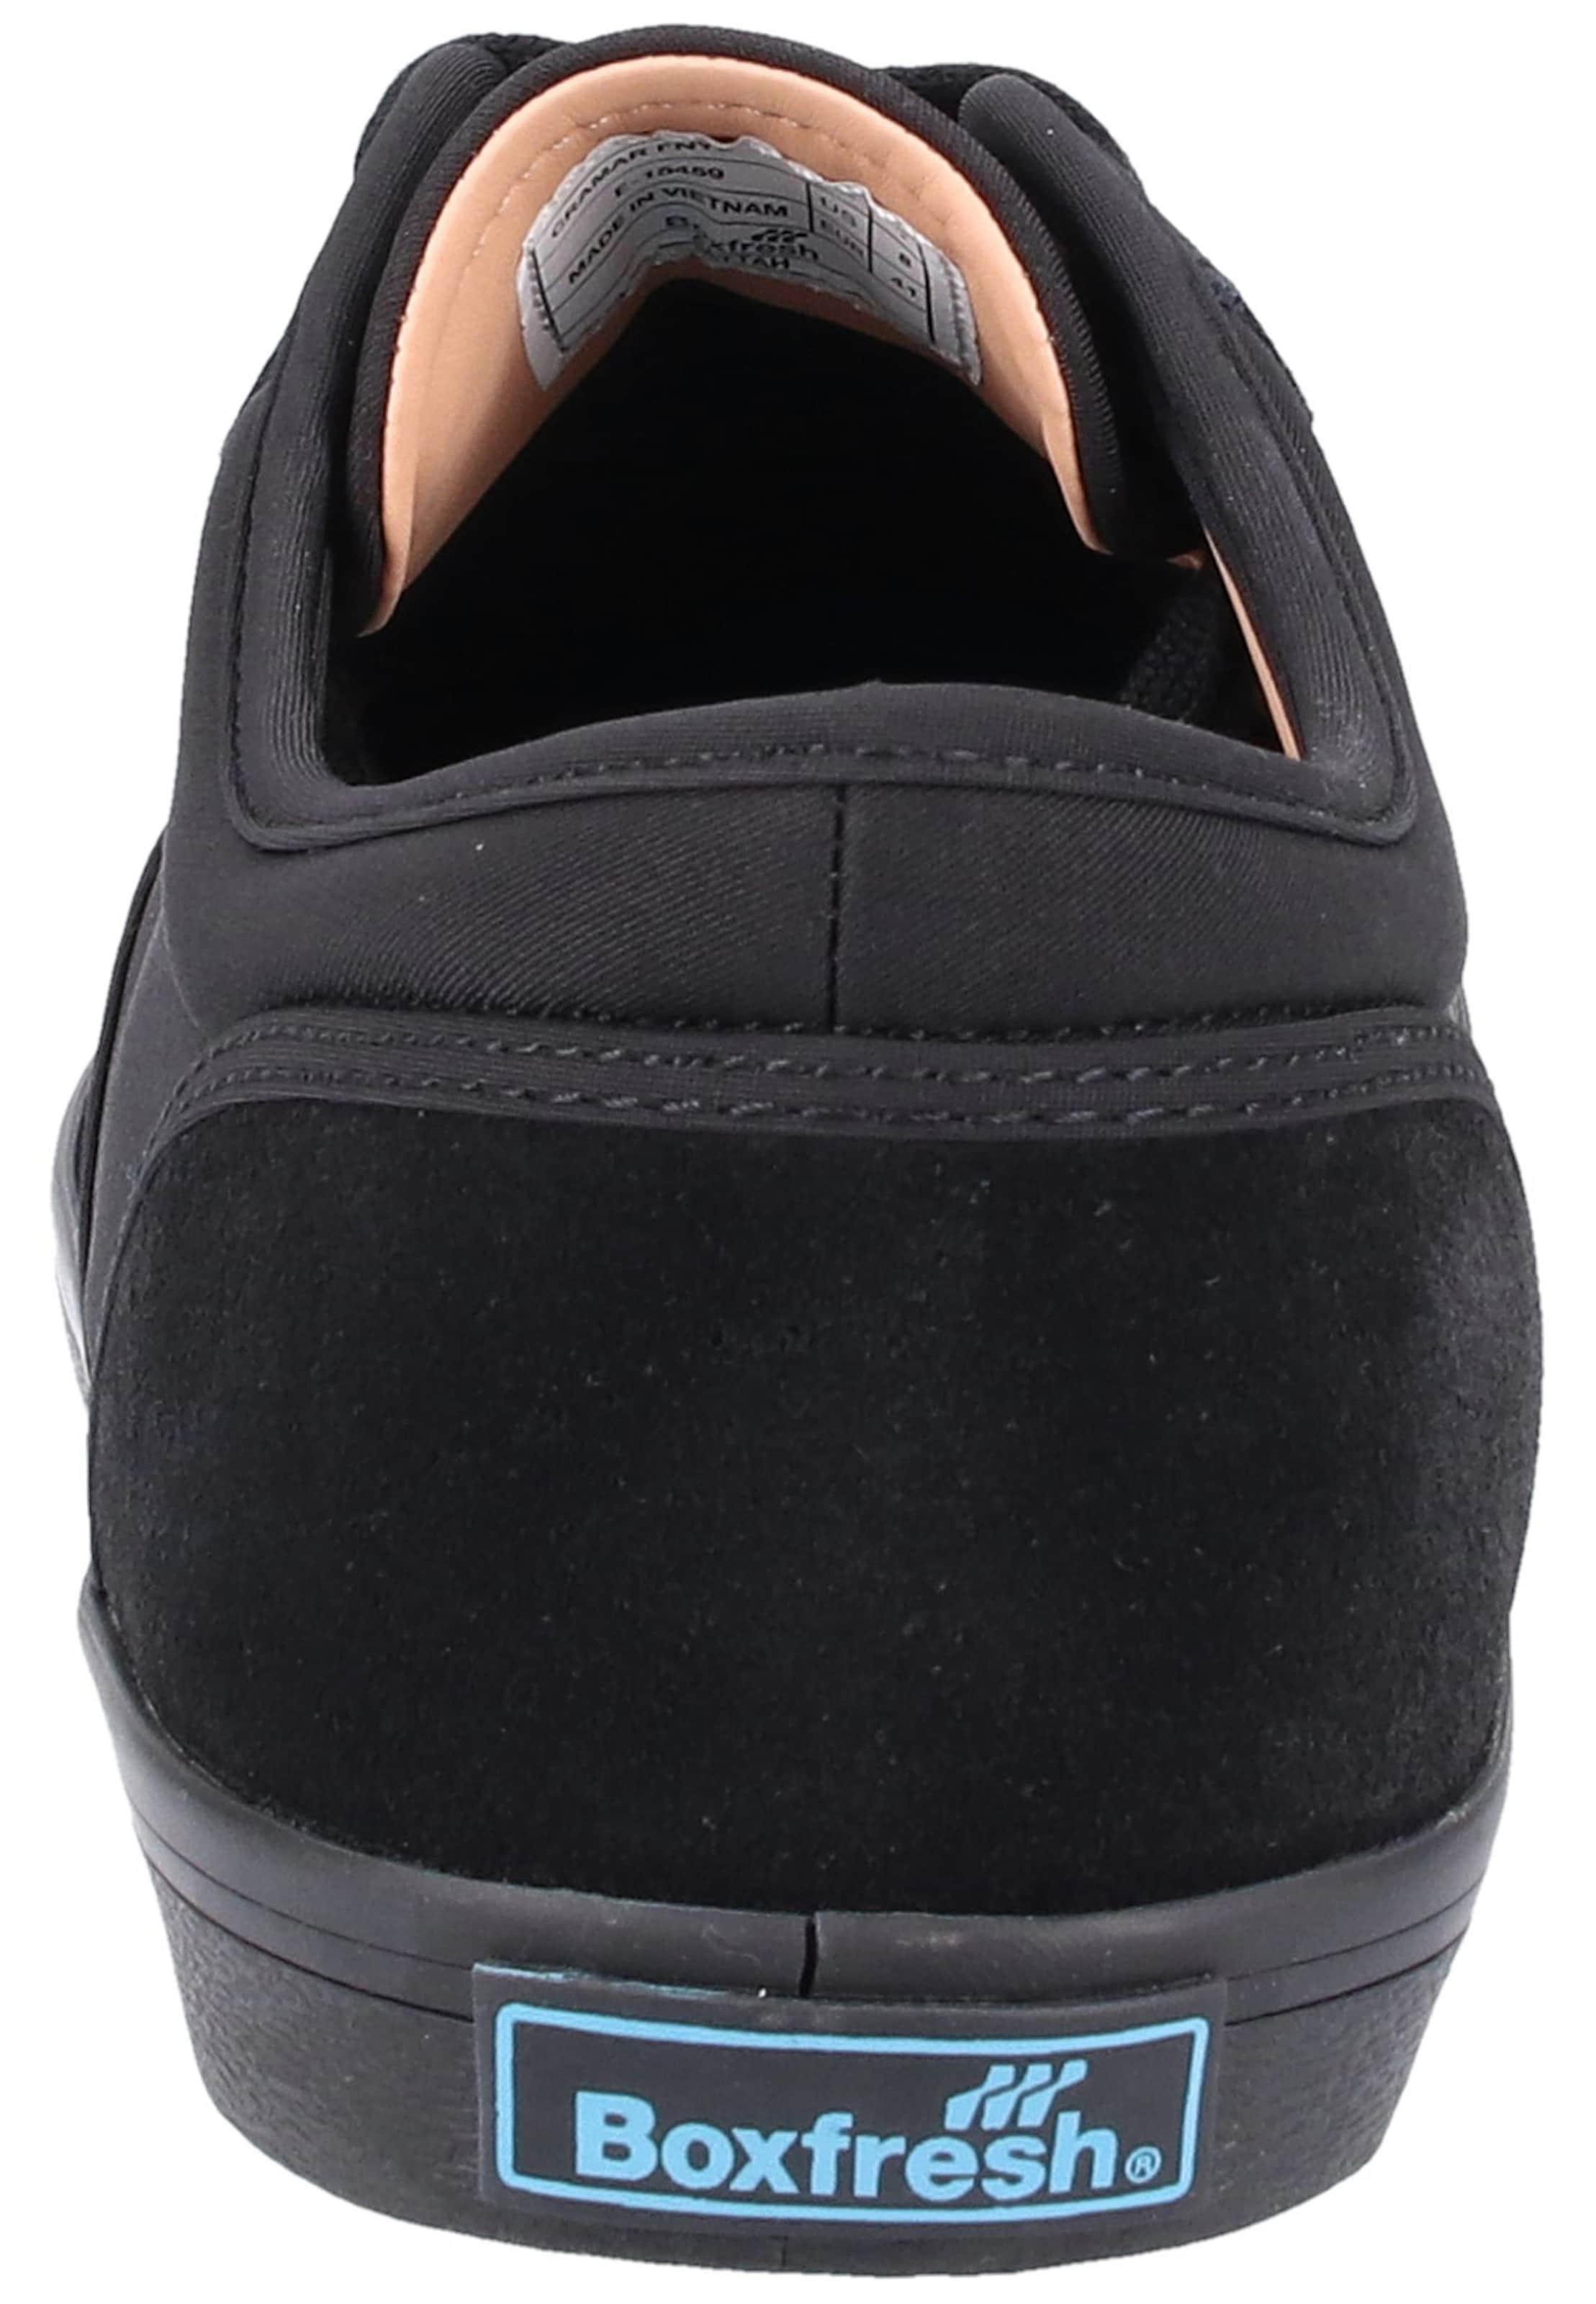 Boxfresh Sneaker Boxfresh In 'cramar' 'cramar' Schwarz Sneaker mynPN08wOv